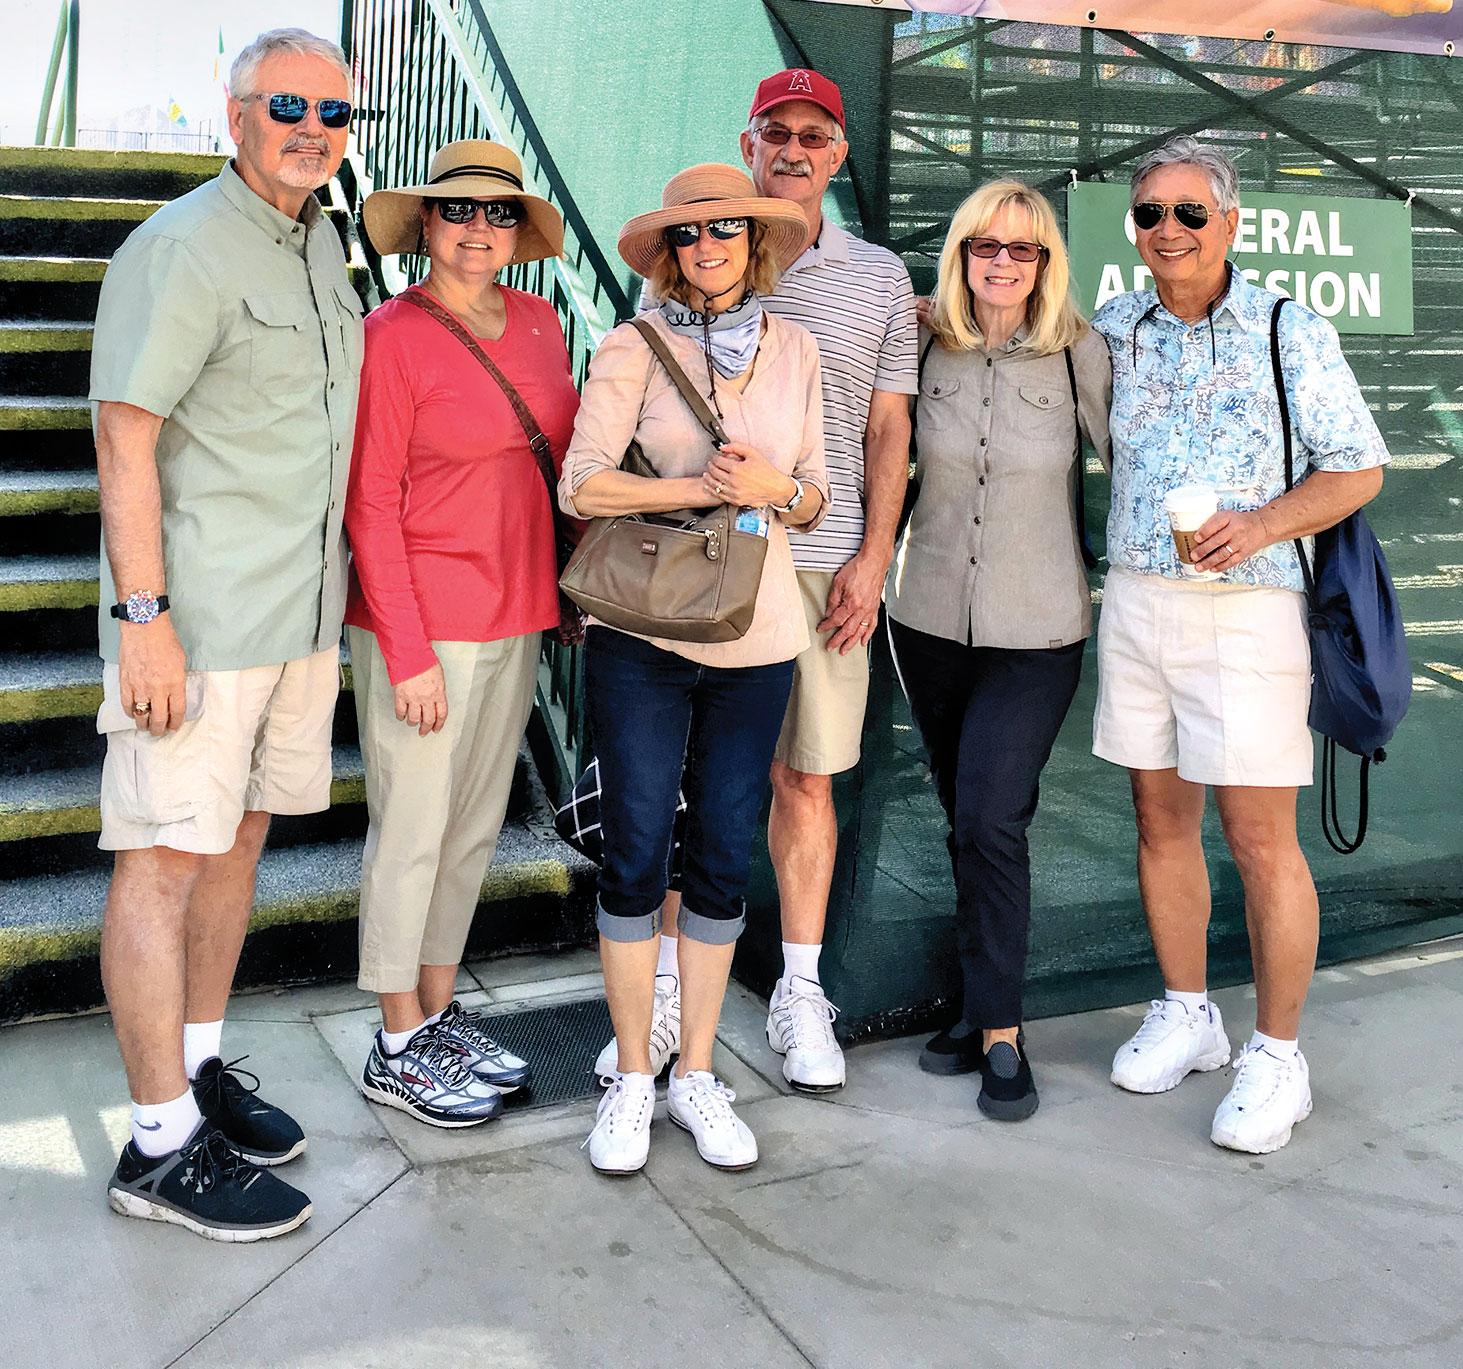 SBRTA members: Wes and Georgine Hurst, Janette and Mark Martin, and Arlene and Mark Wong; photo taken by Arlene Wong